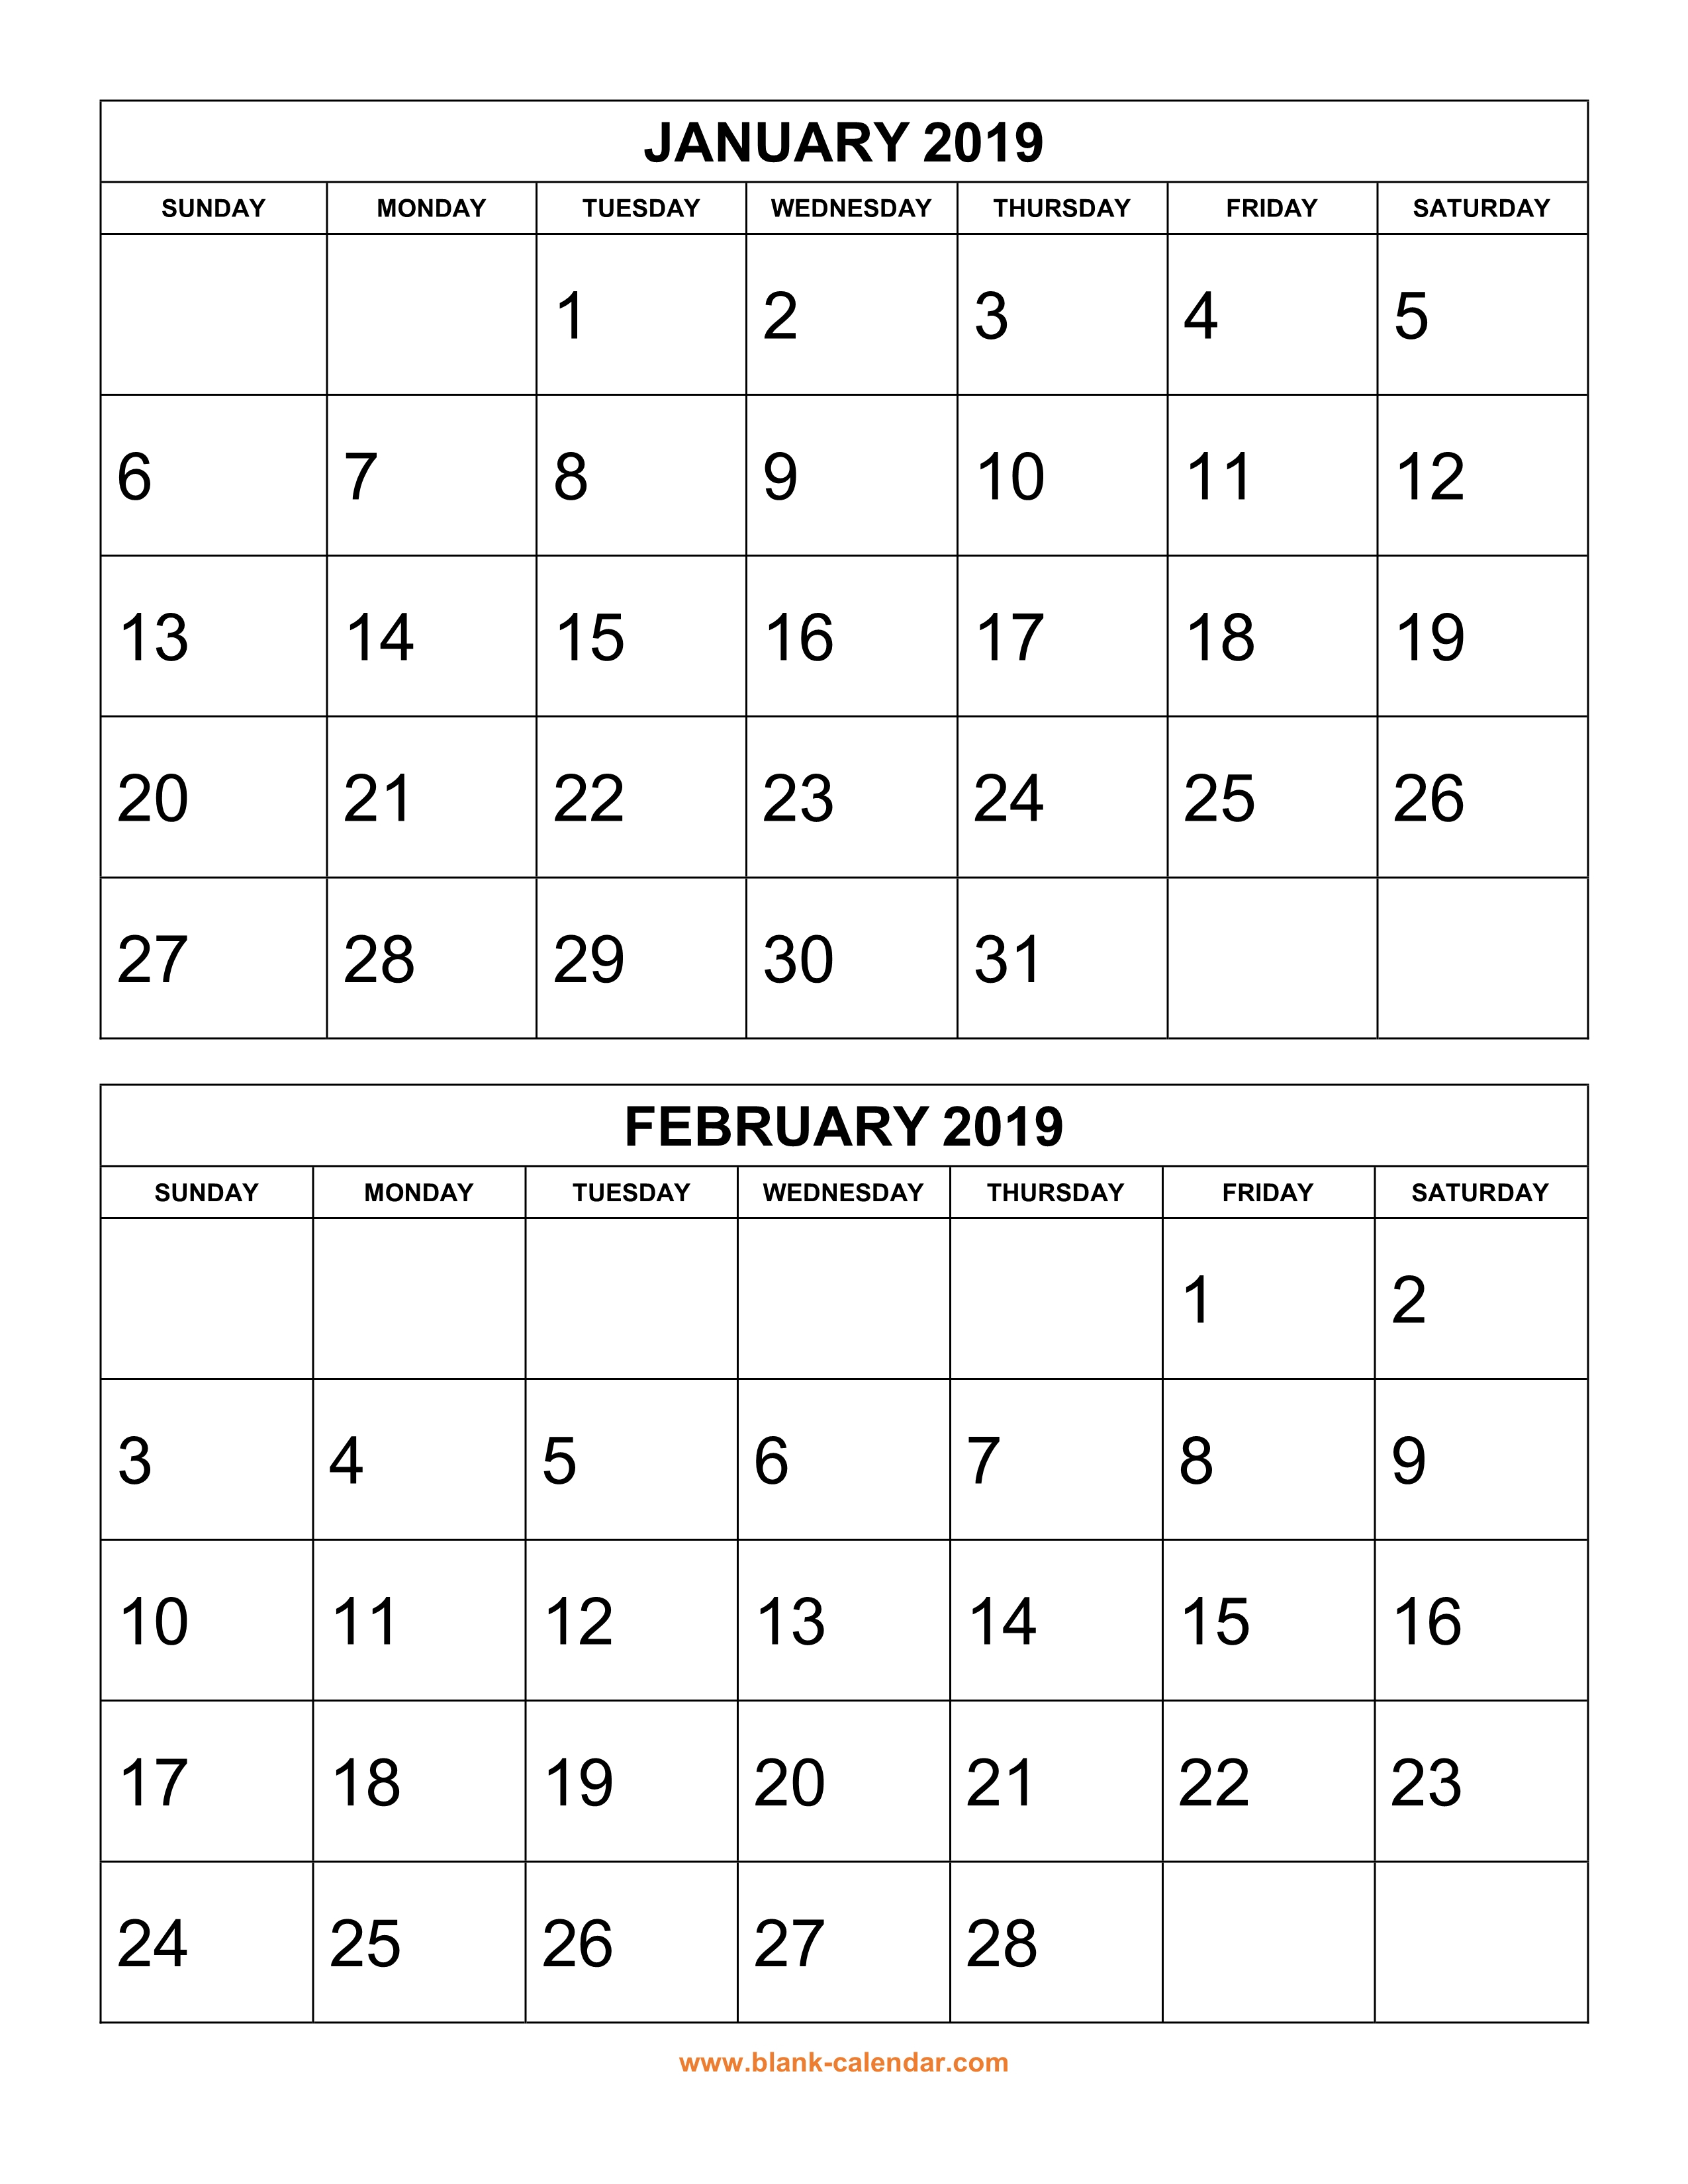 Free Download Printable Calendar 2019, 2 Months Per Page, 6 Pages regarding Blank 6 Month Calendar